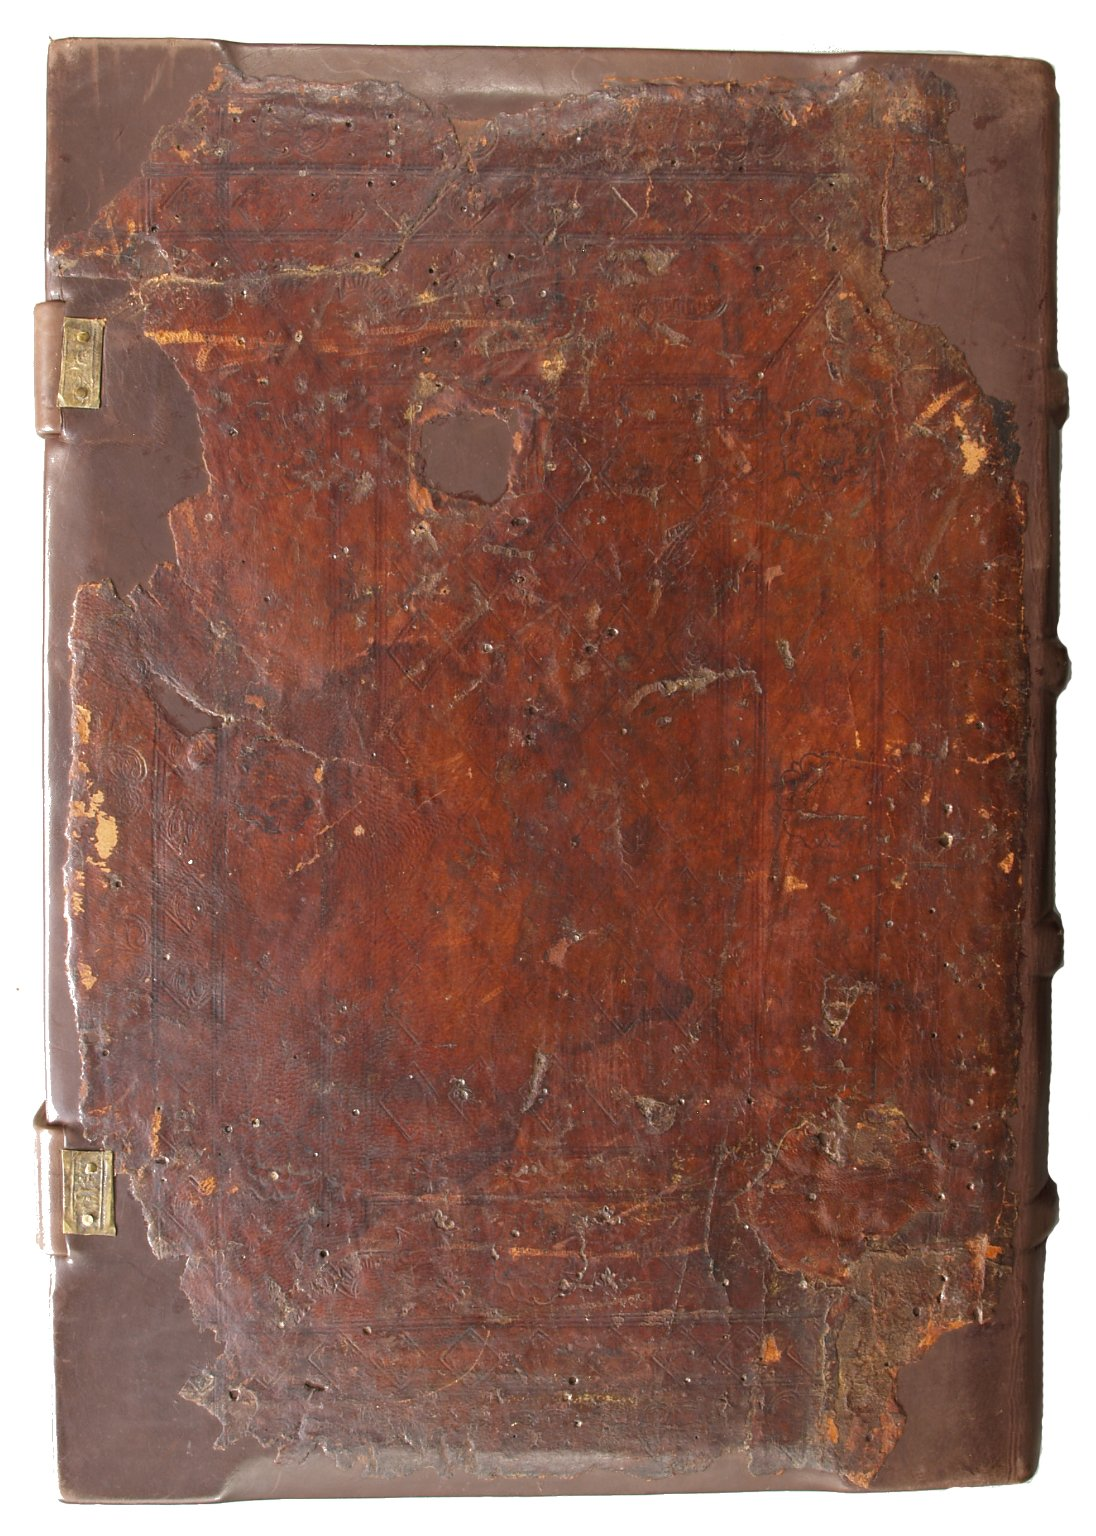 Back cover, INC R8 volume 2.